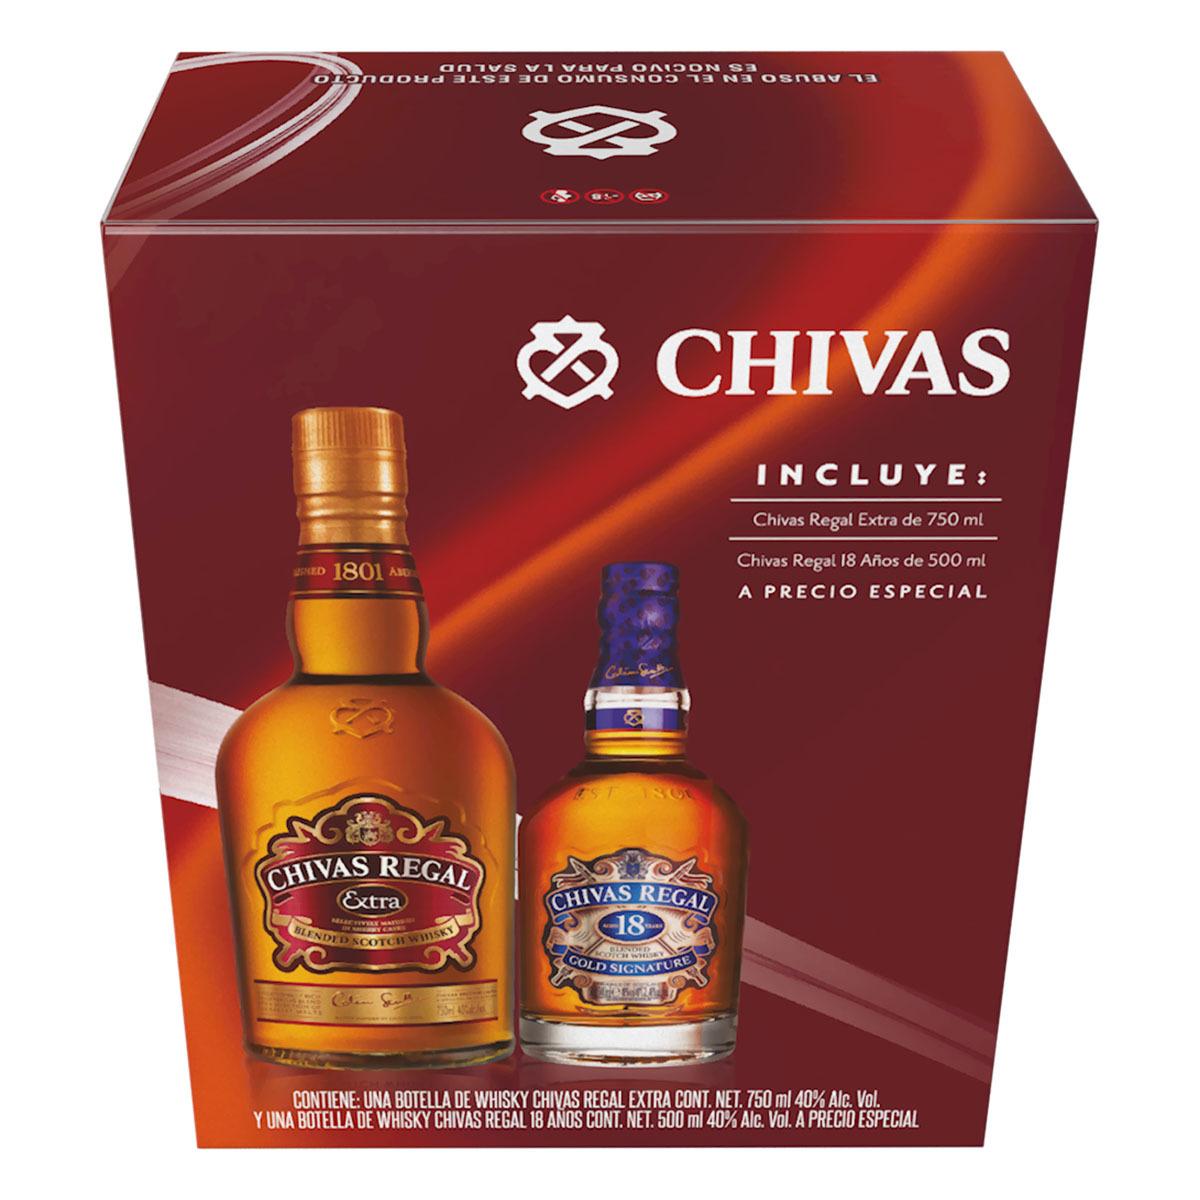 Chedraui: Chivas Regal extra + chivas +18 500 ml